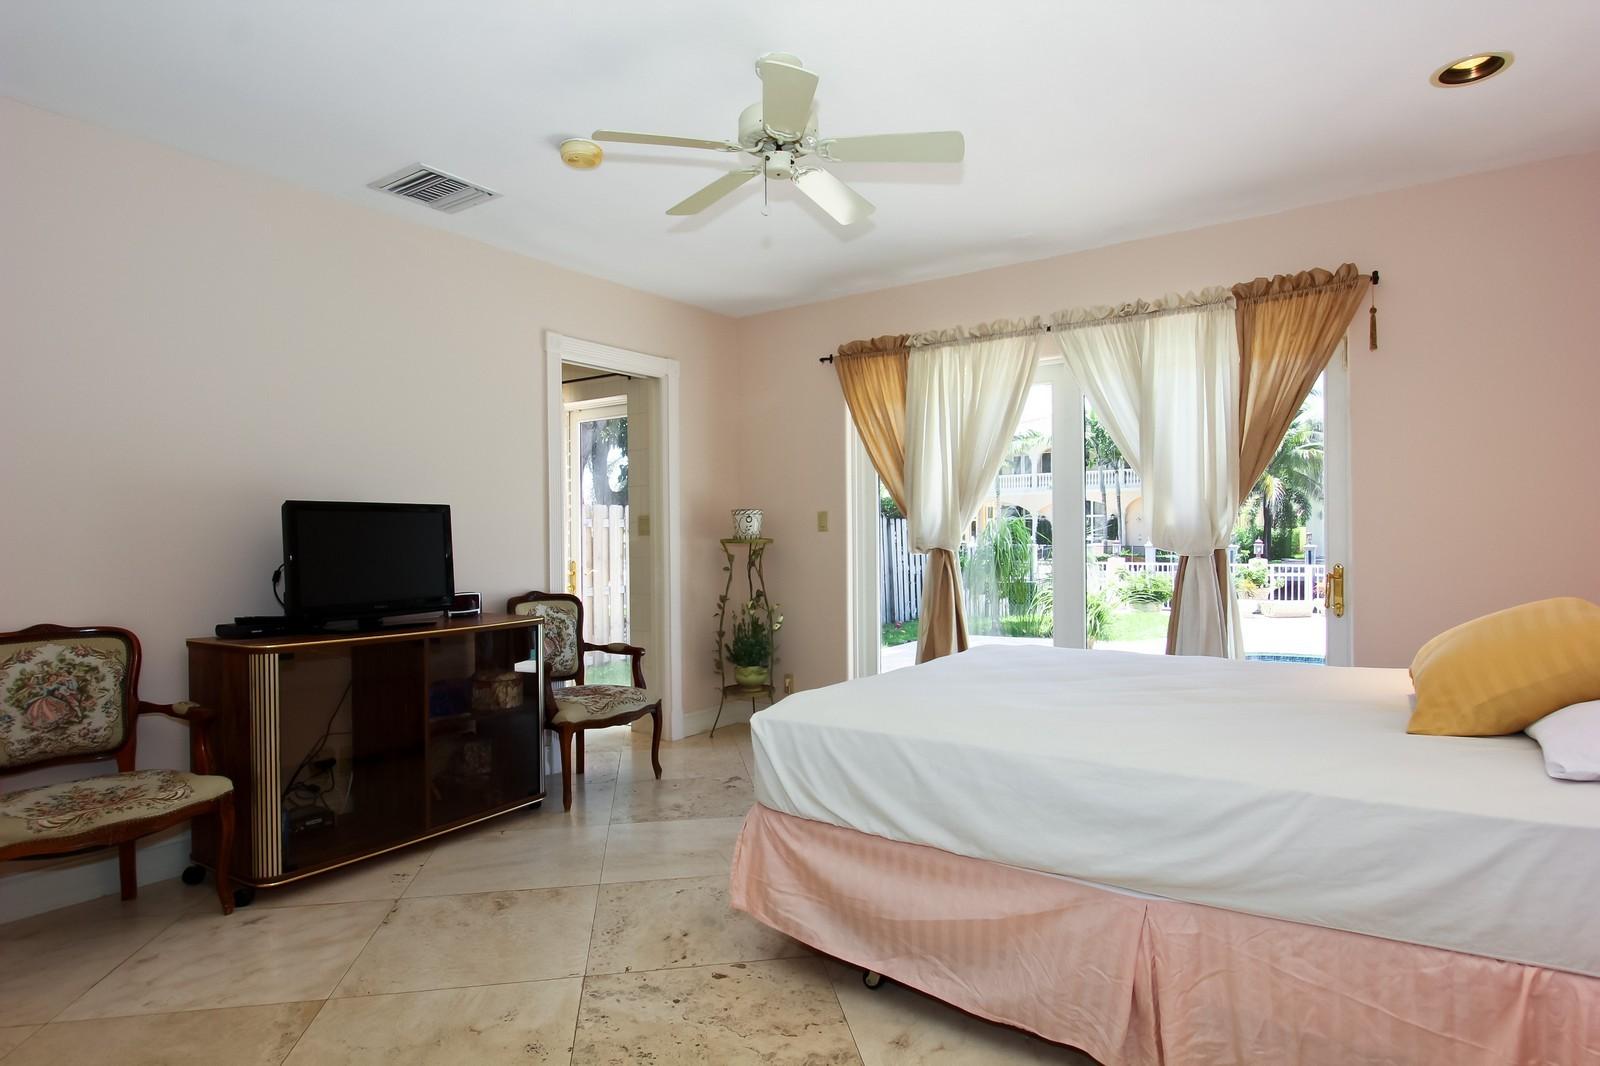 Real Estate Photography - 3310 NE 58th St, Fort Lauderdale, FL, 33308 - Bedroom